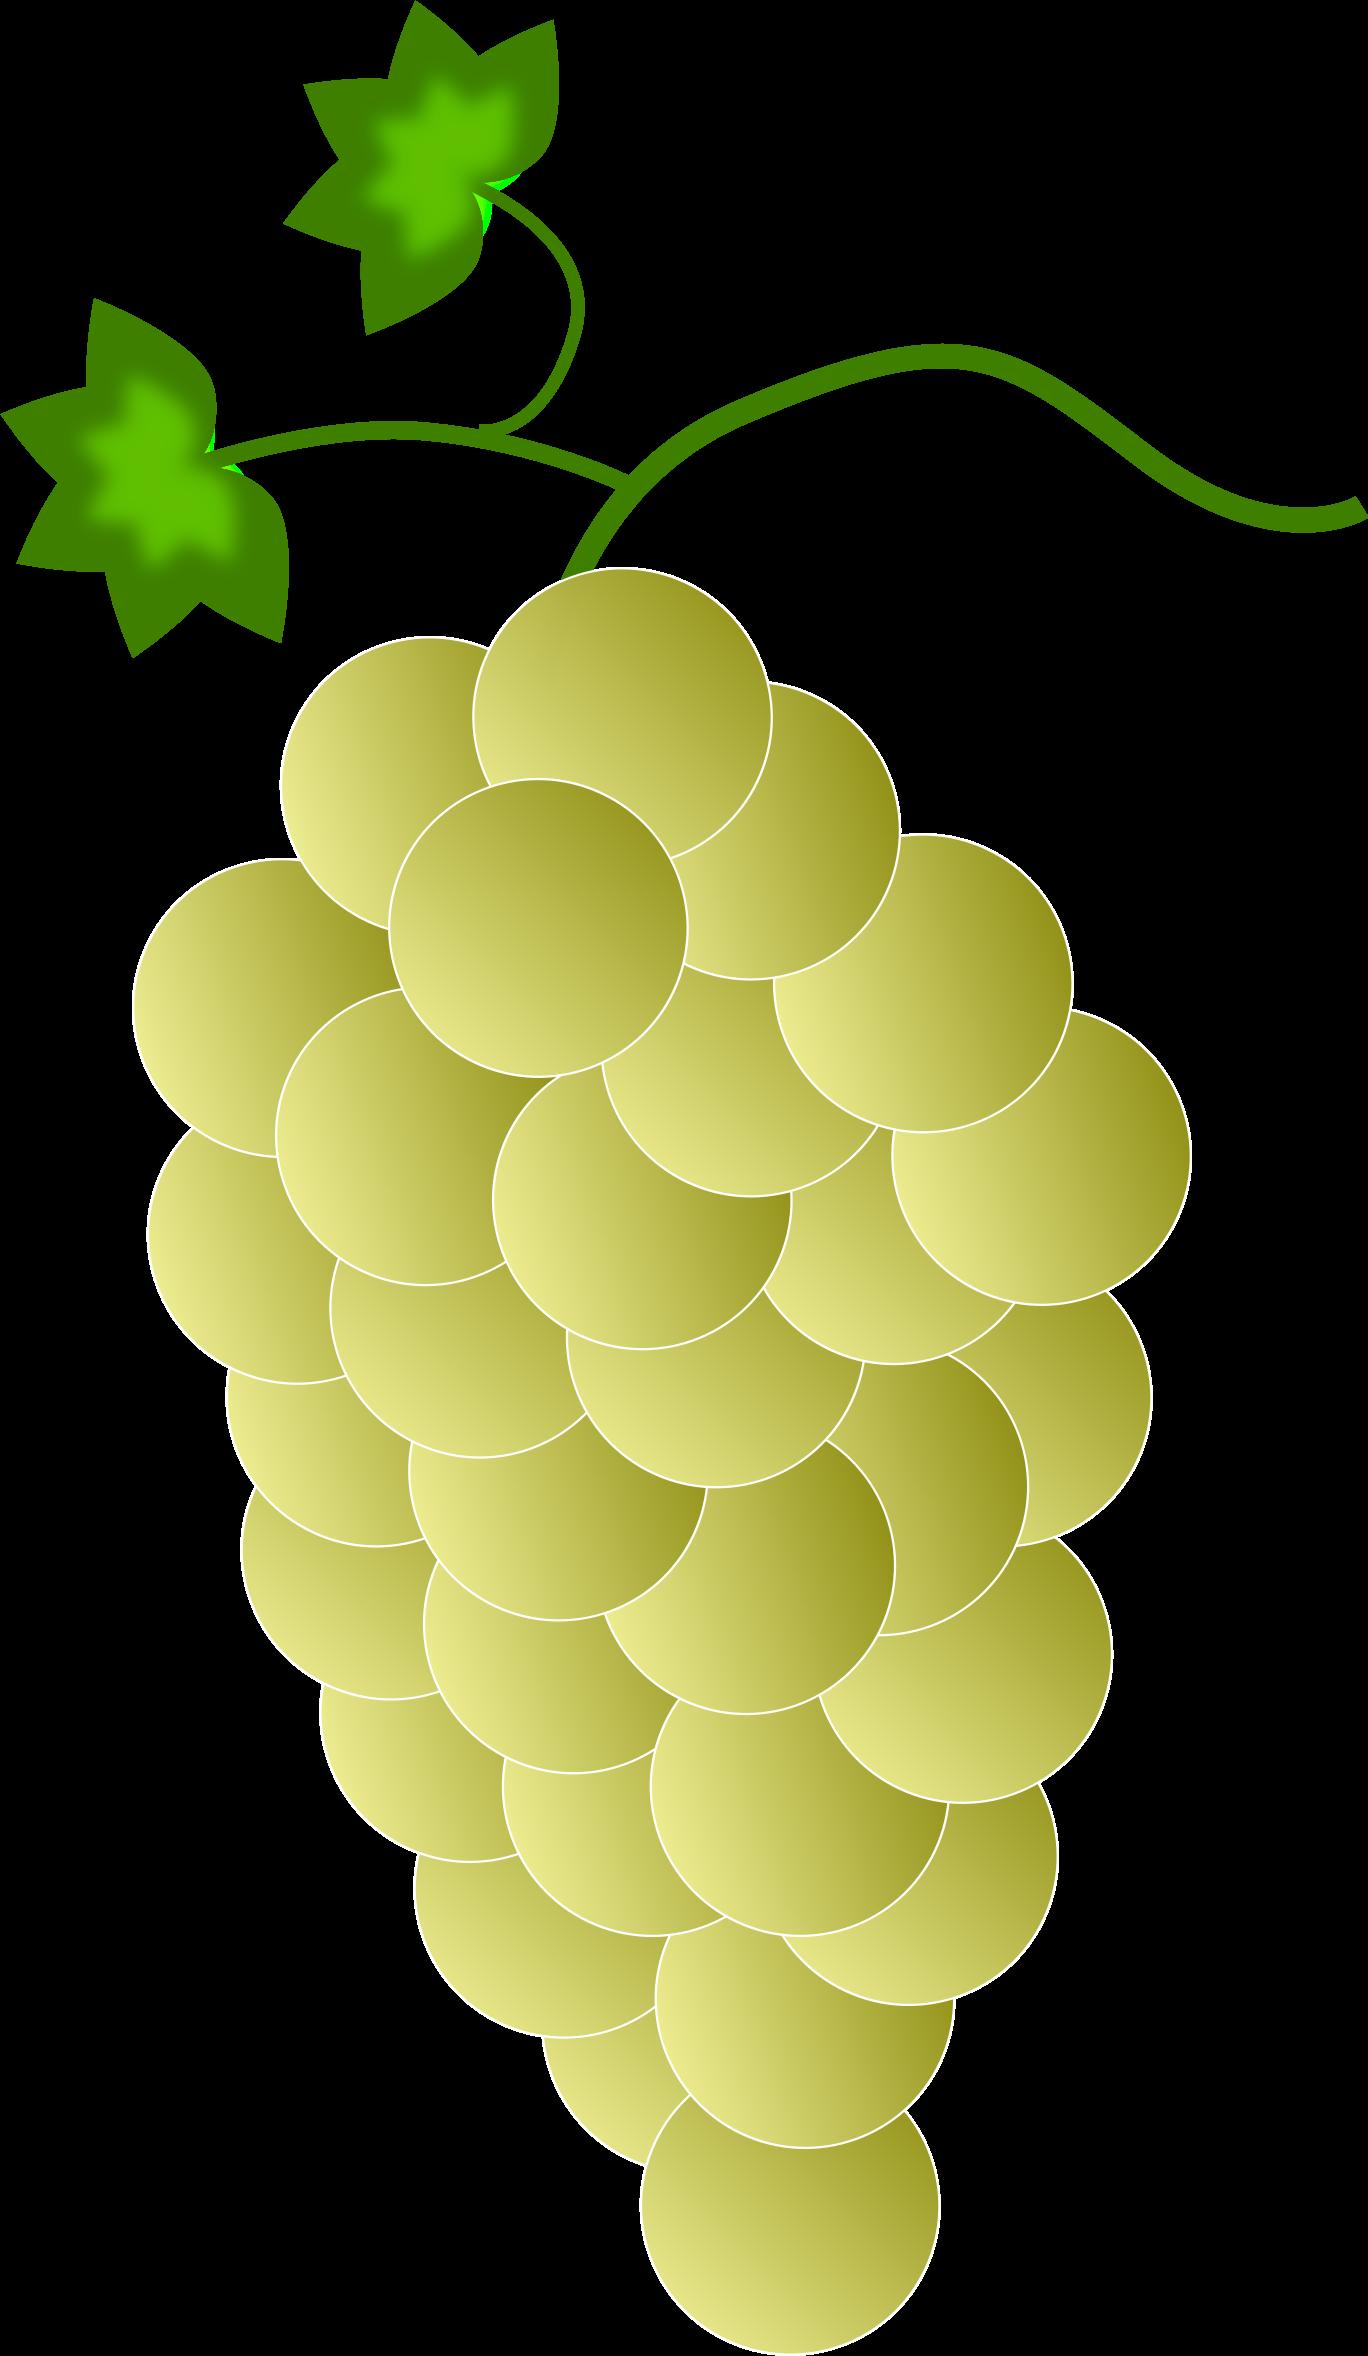 Grapes clipart ten. Yellow big image png